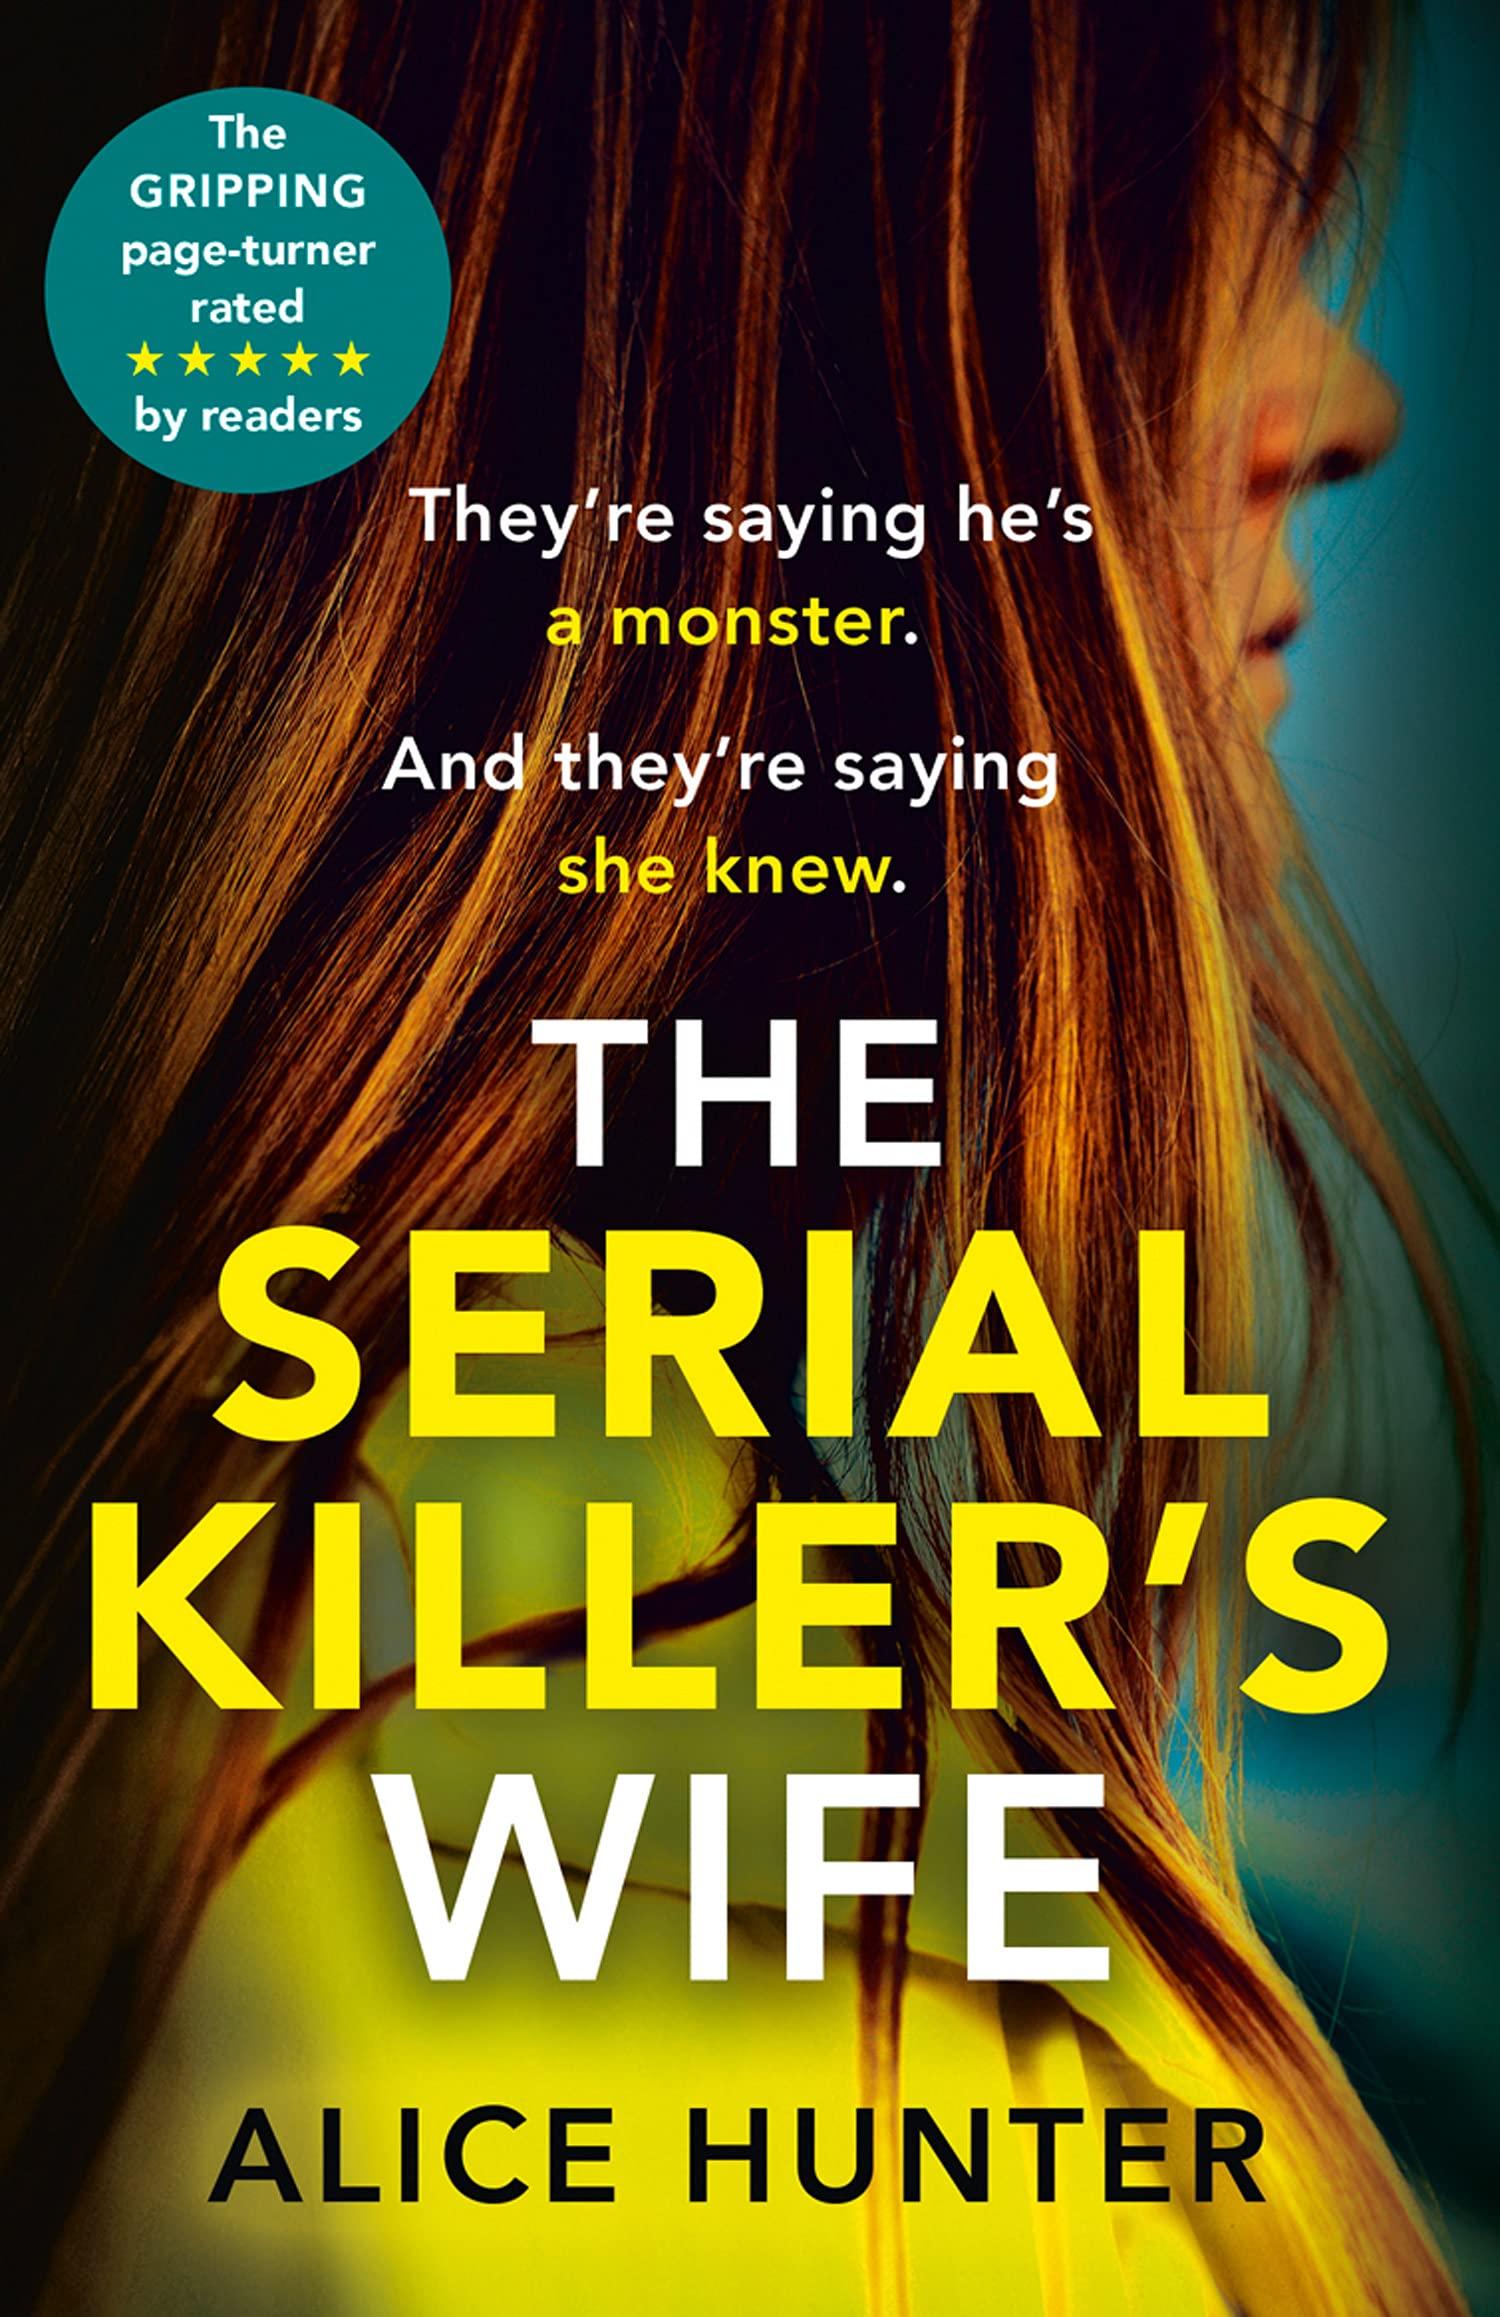 Win a paperback copy of The Serial Killer's Wife alongside a Colourblock Papier notebook.